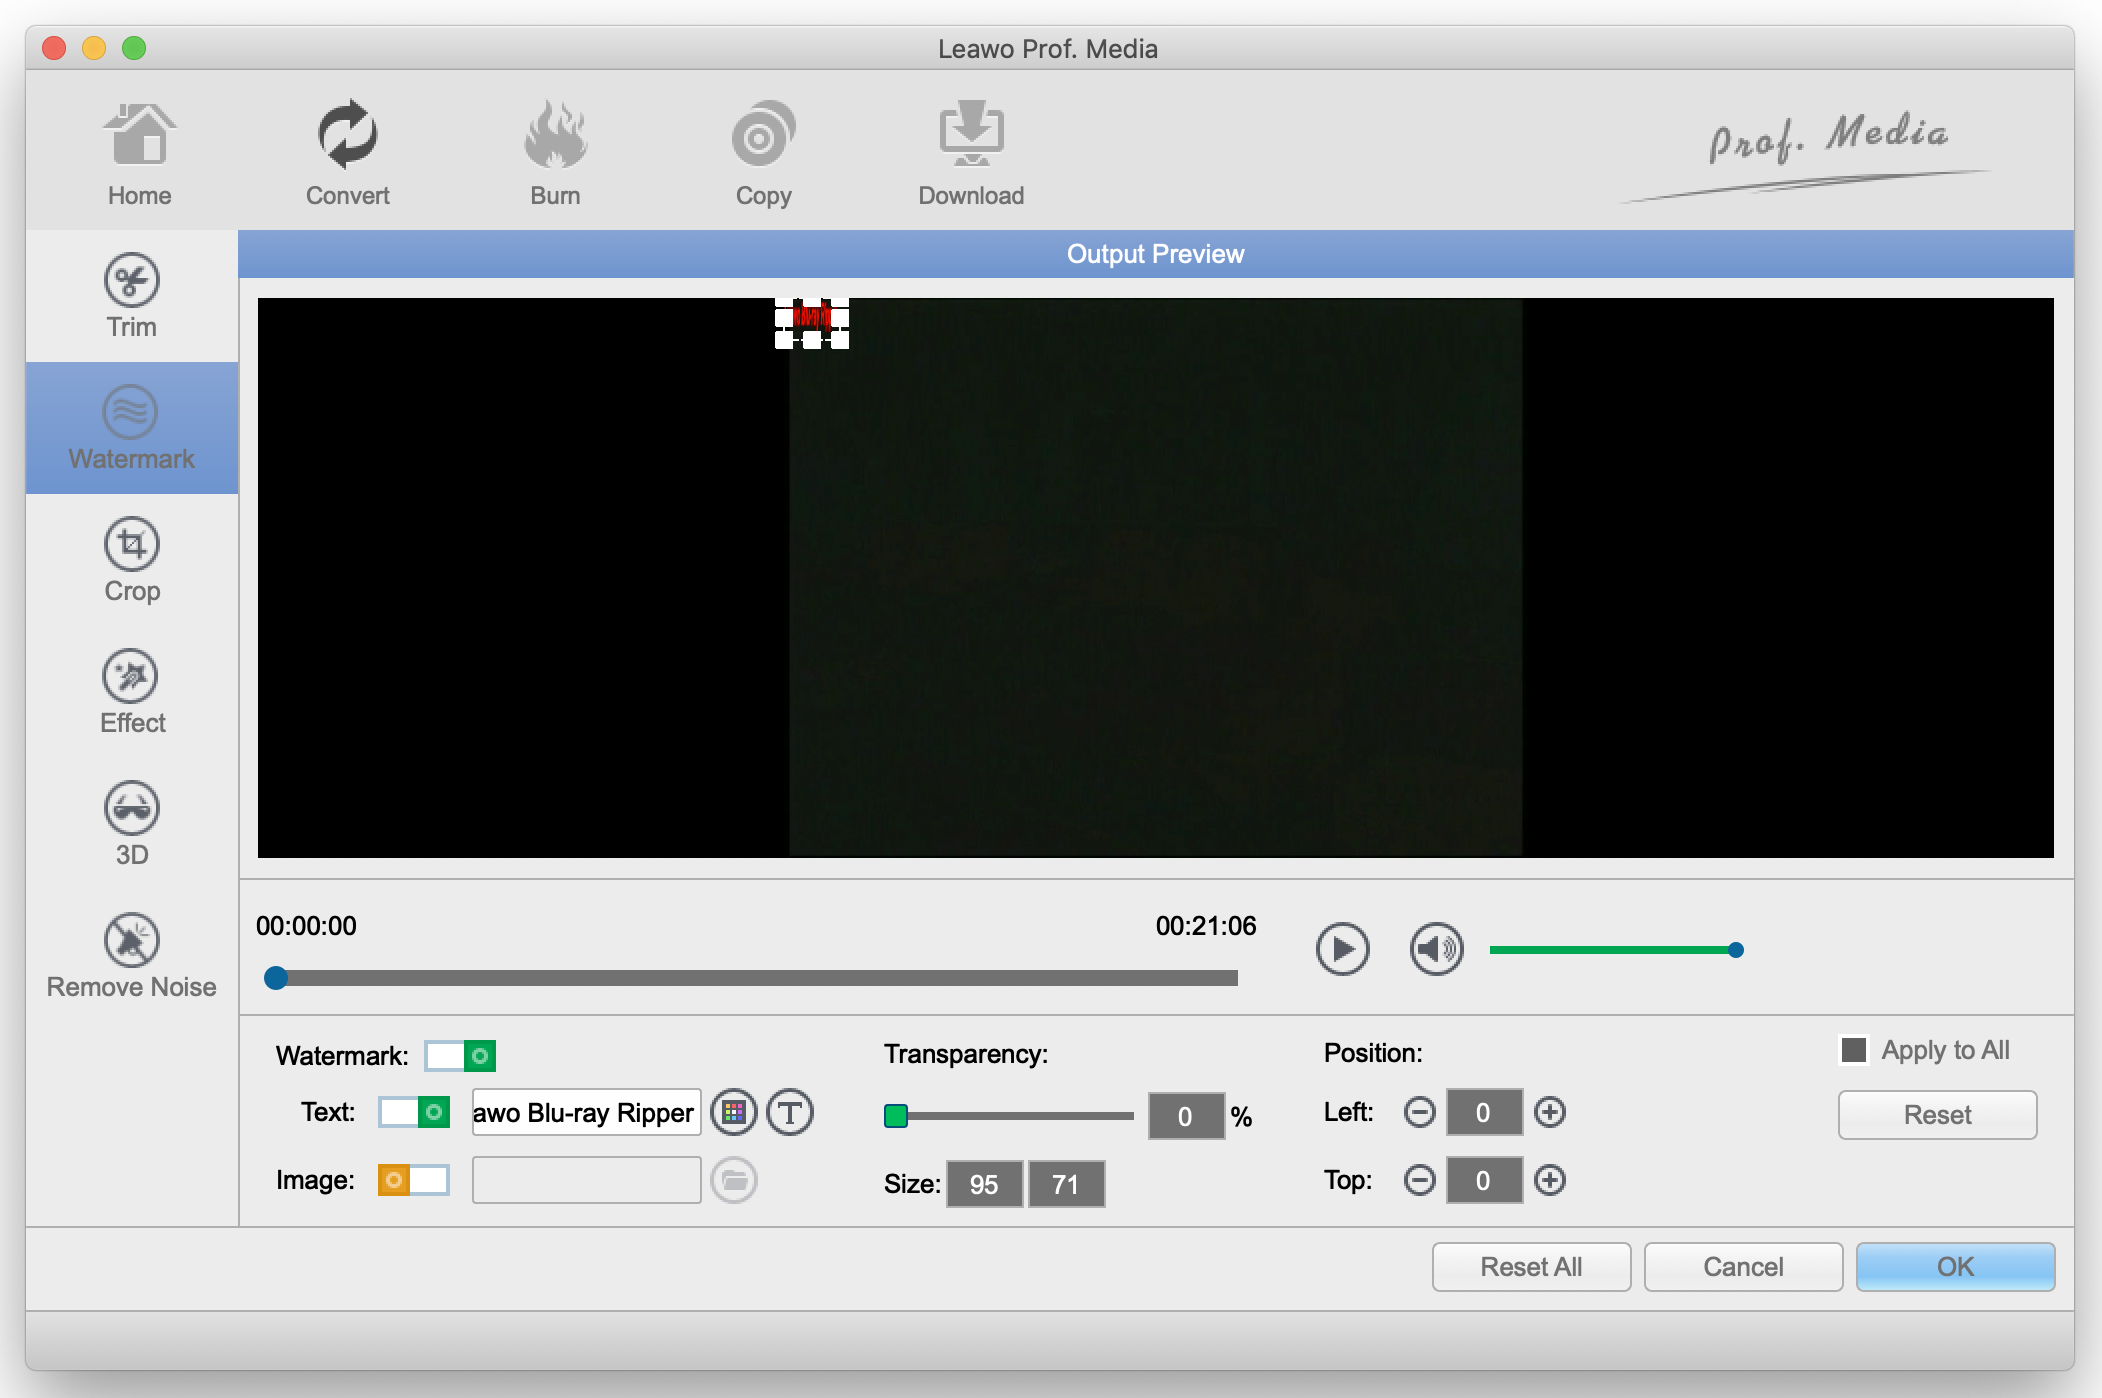 Leawo-personalizing-the-video